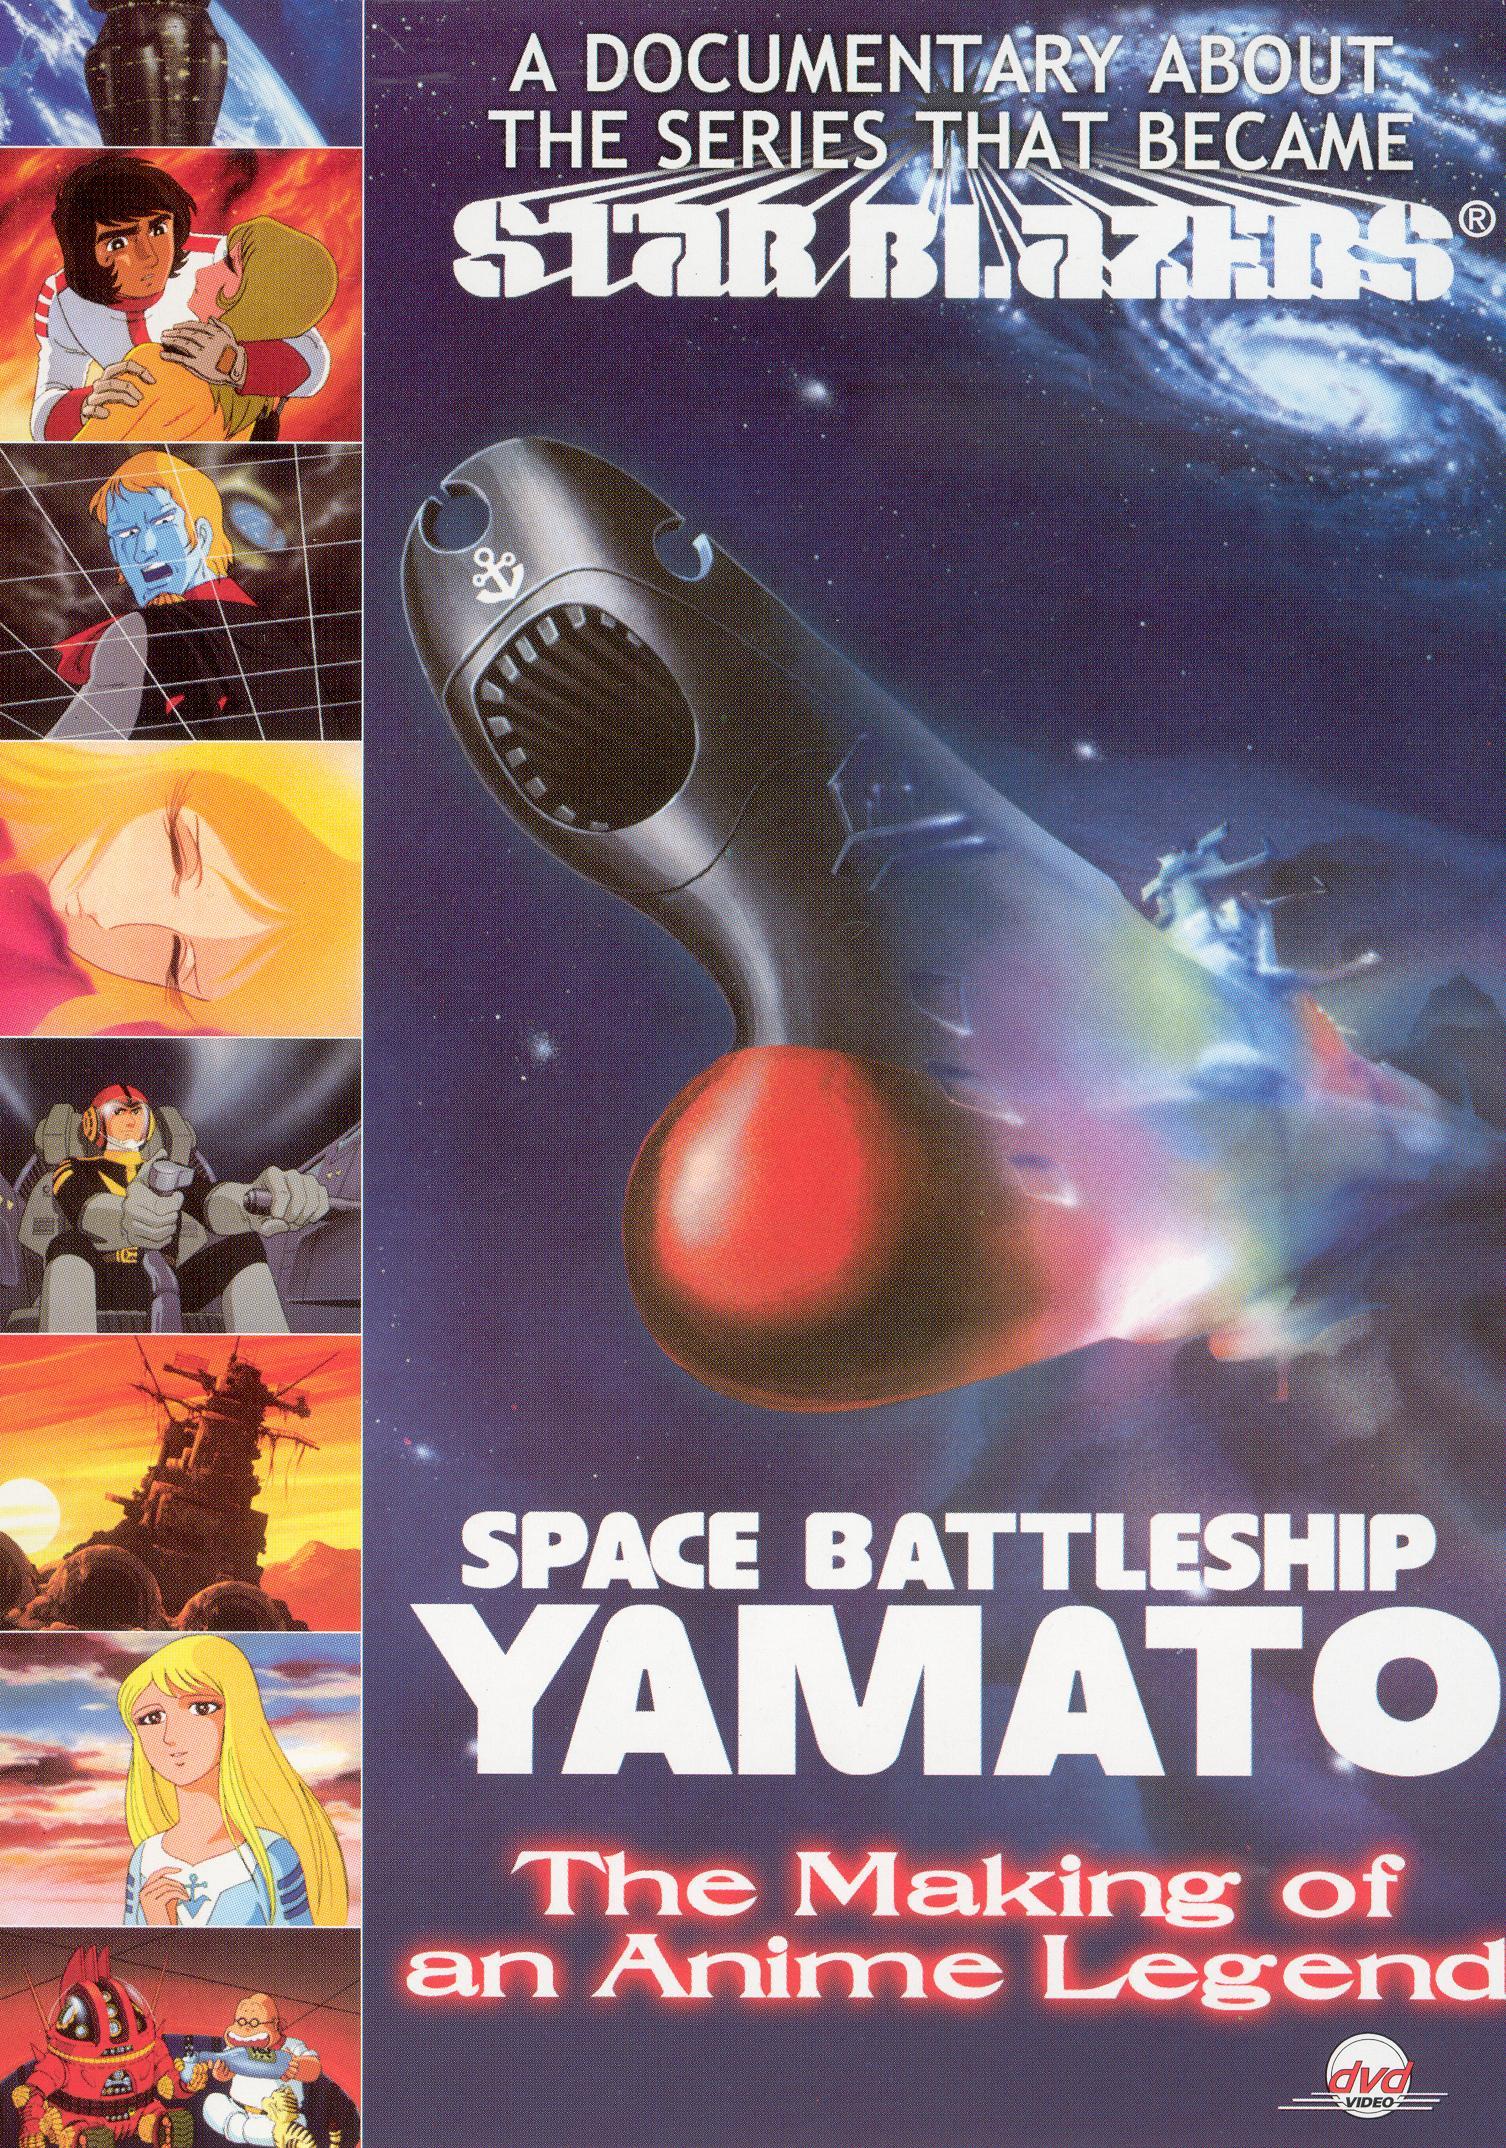 Space Battleship Yamato: The Making of a Legend